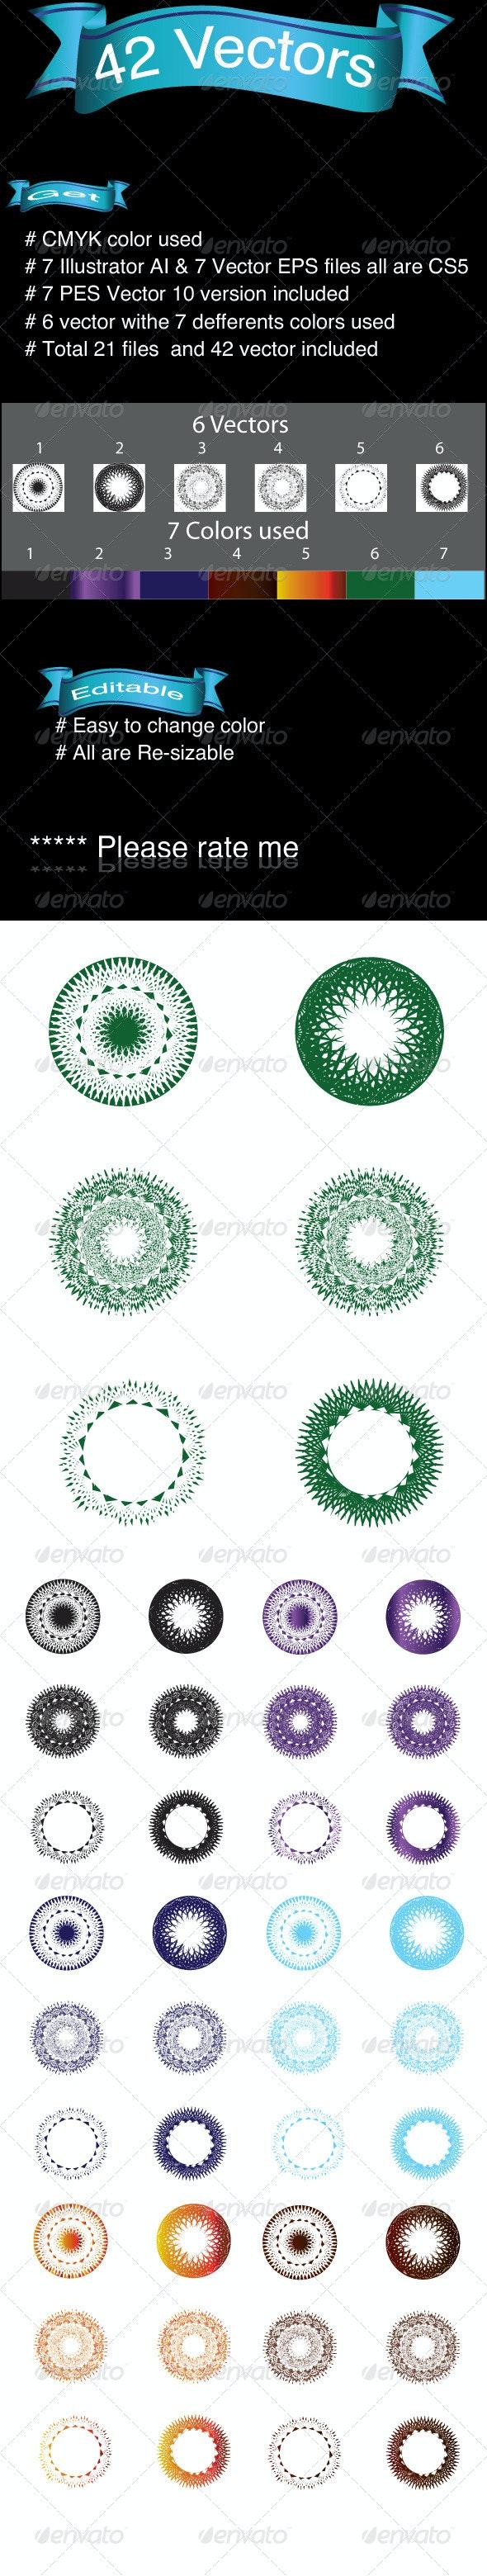 42 Vectors - Flourishes / Swirls Decorative